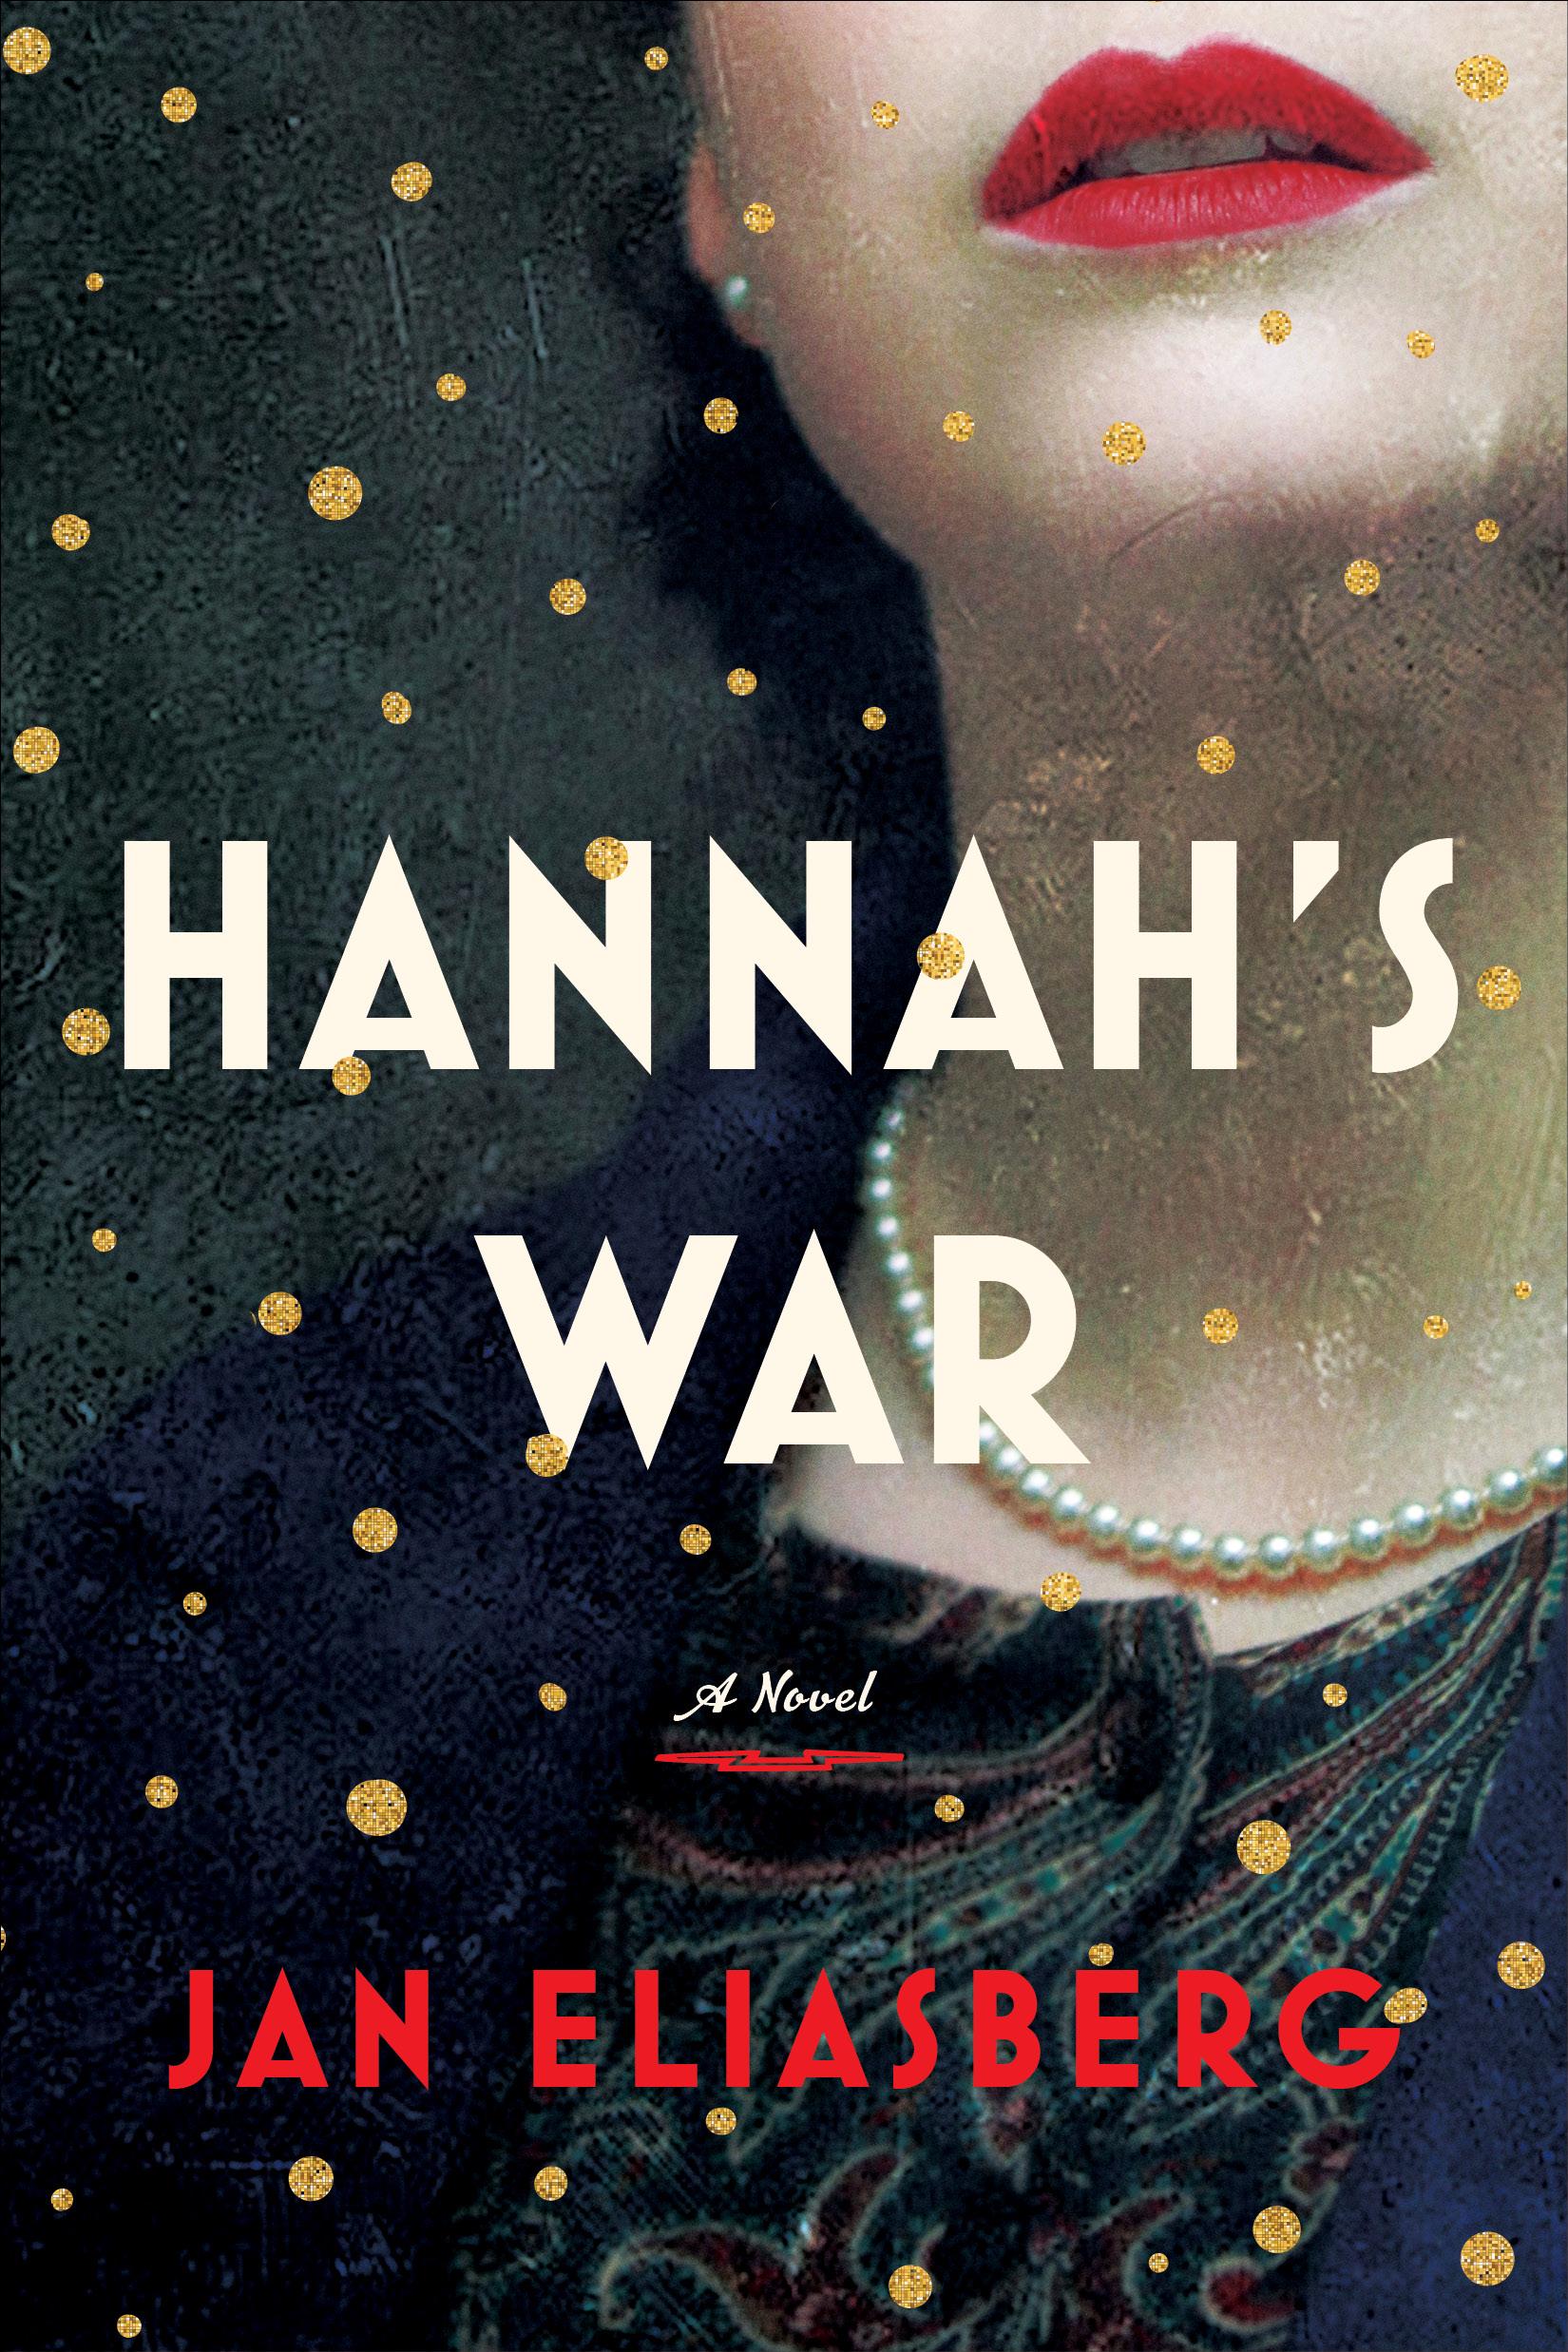 The book cover of Jan Eliasberg's new book, Hannah's War